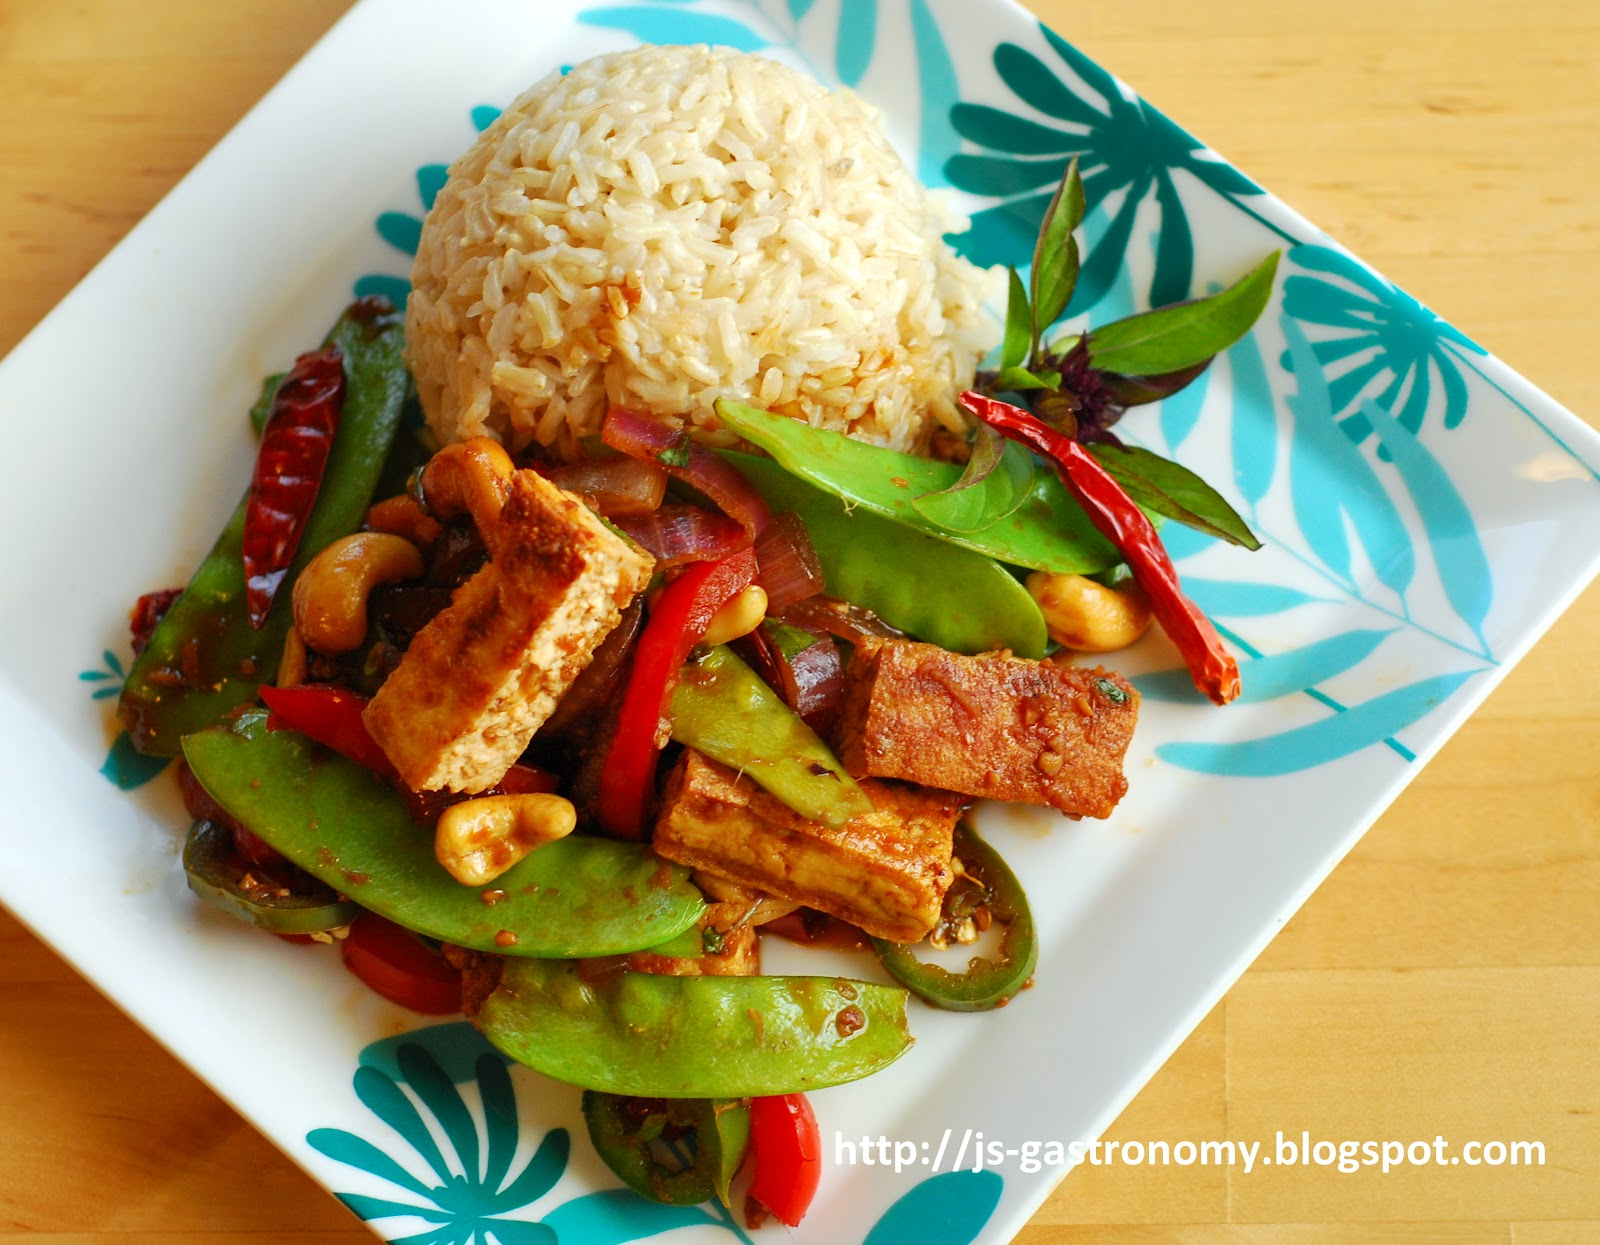 Gastronomy: Spicy Thai Basil Stir Fry with Tofu and Cashews